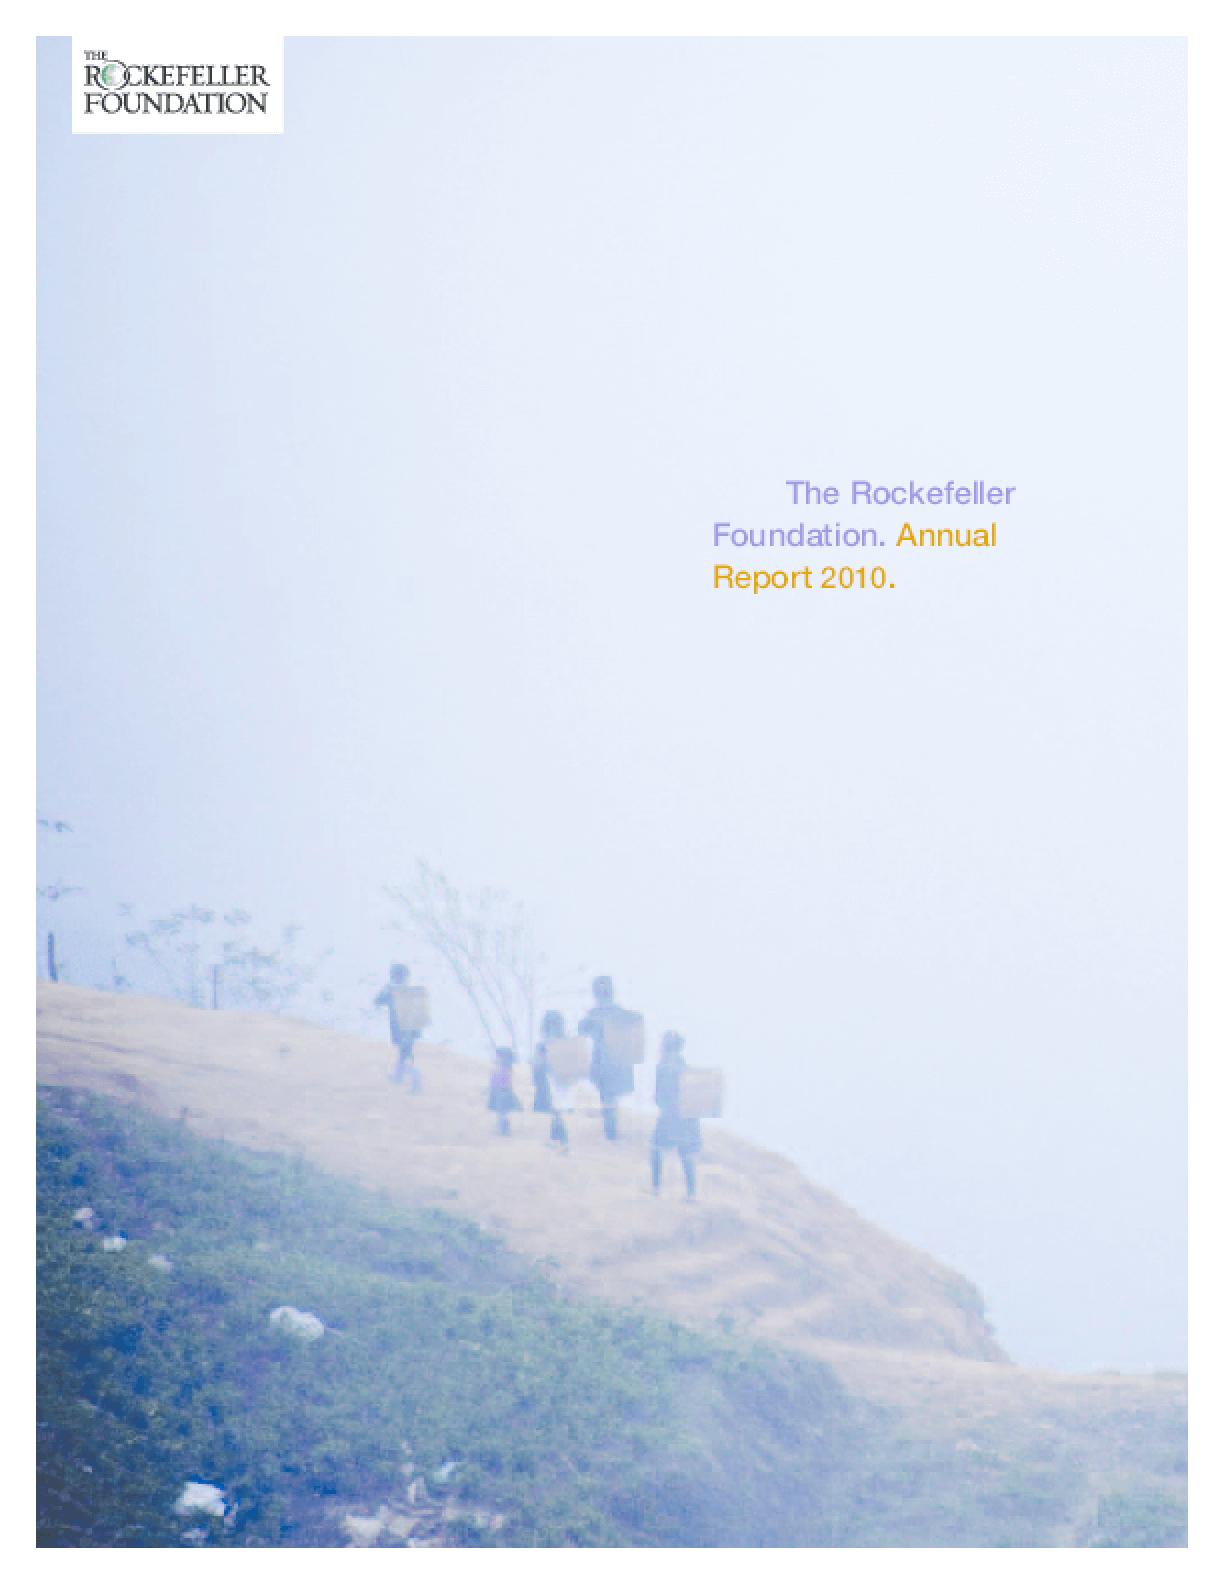 Rockefeller Foundation 2010 Annual Report